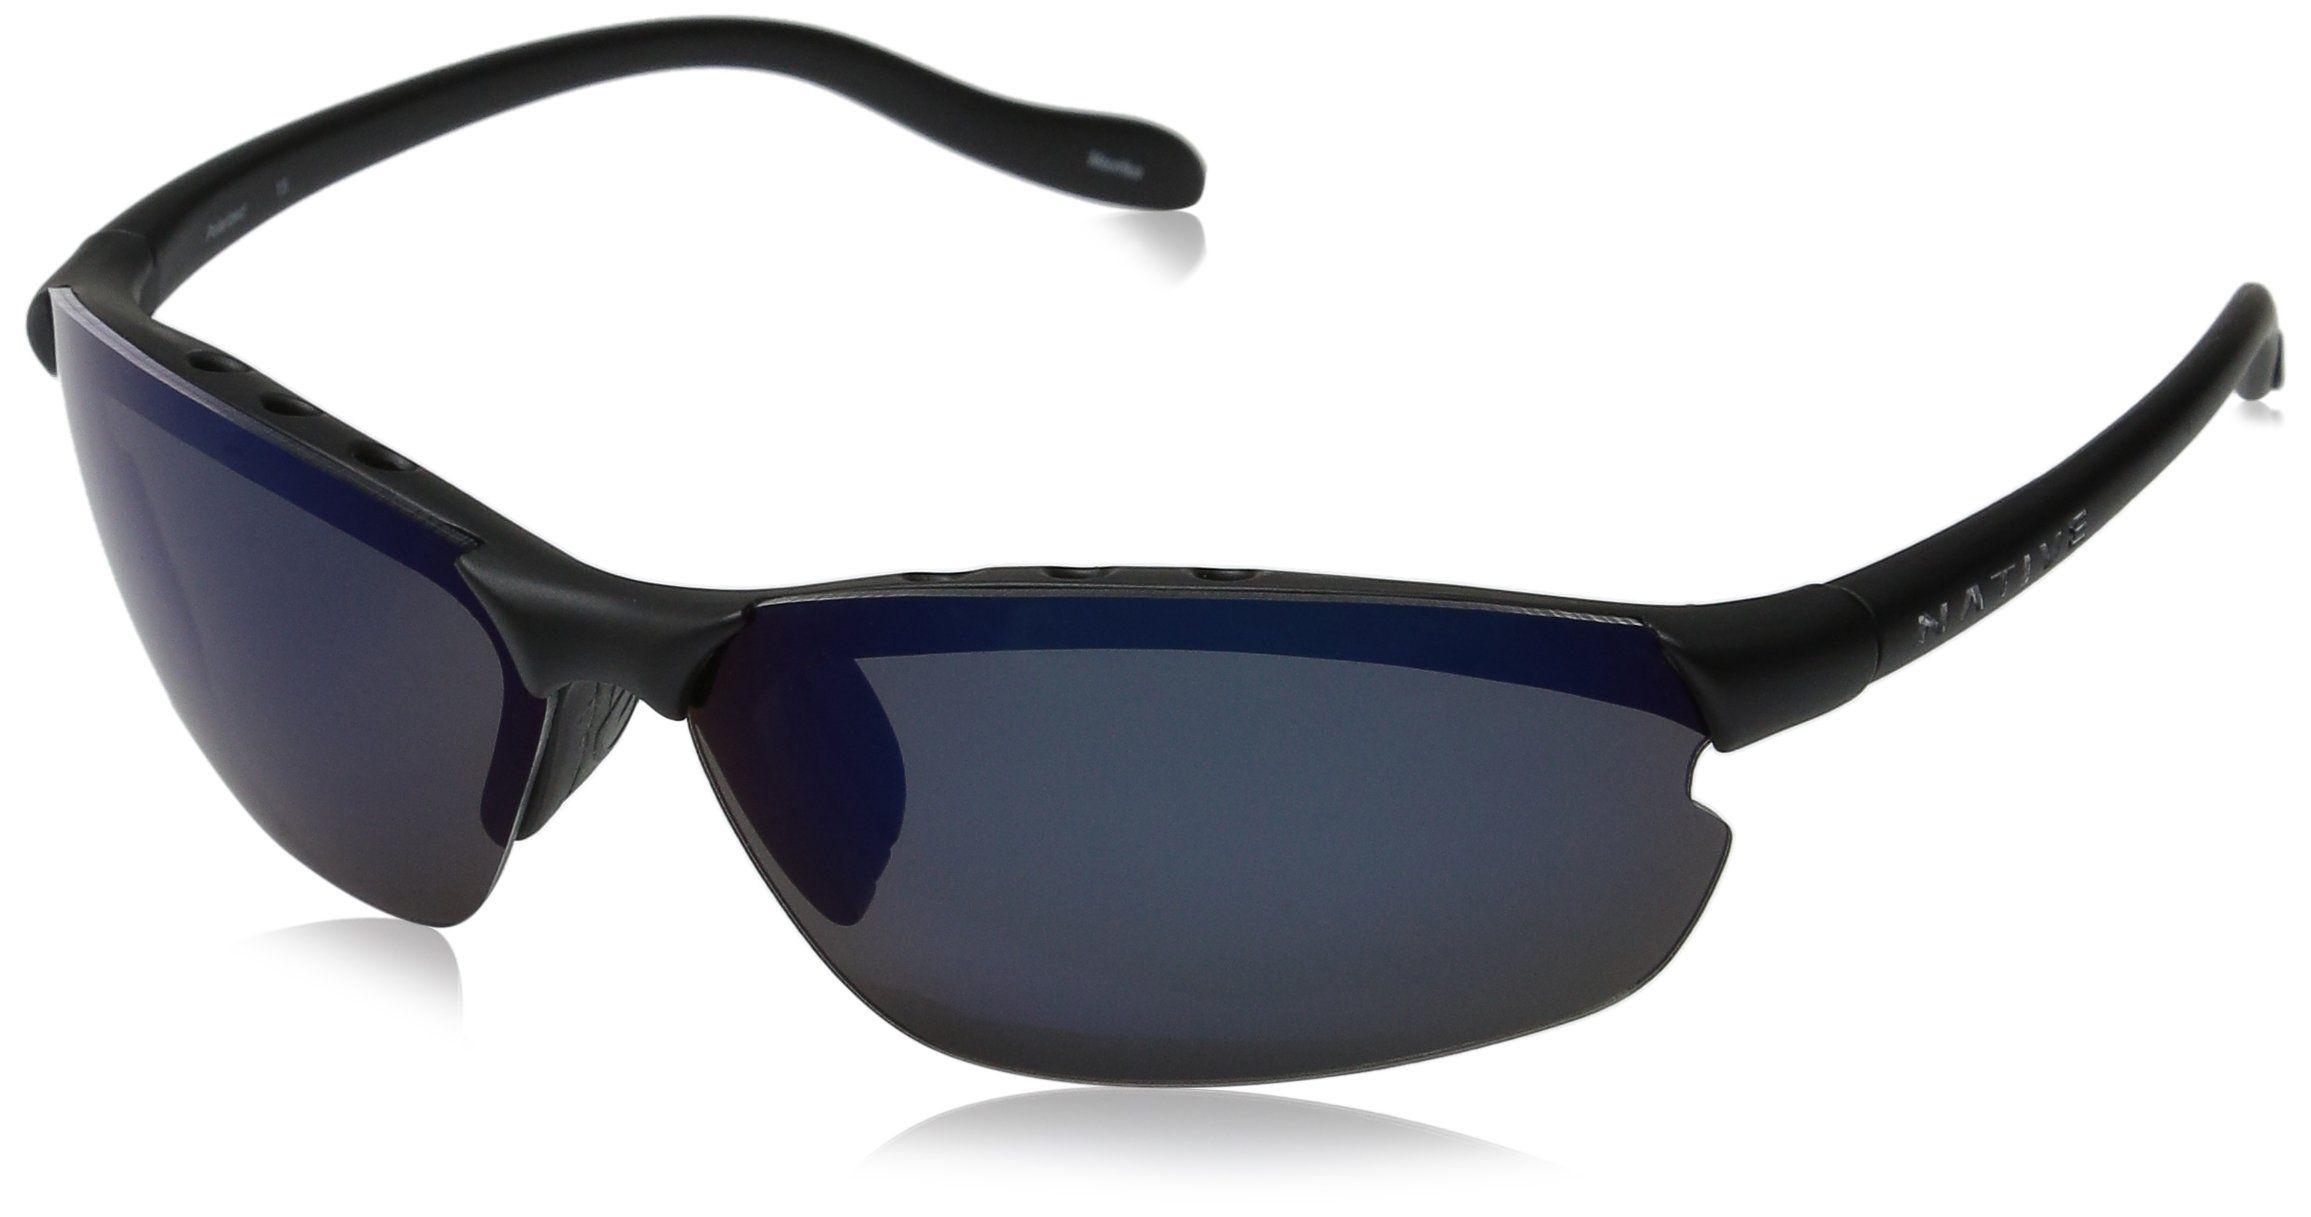 411341a15d94 Native Eyewear Dash XP Sunglasses, Asphalt with Blue Reflex Gray Lens.  Interchangeable Lenses. Vented to eliminate fogging. Weighs less then 1  ounce.